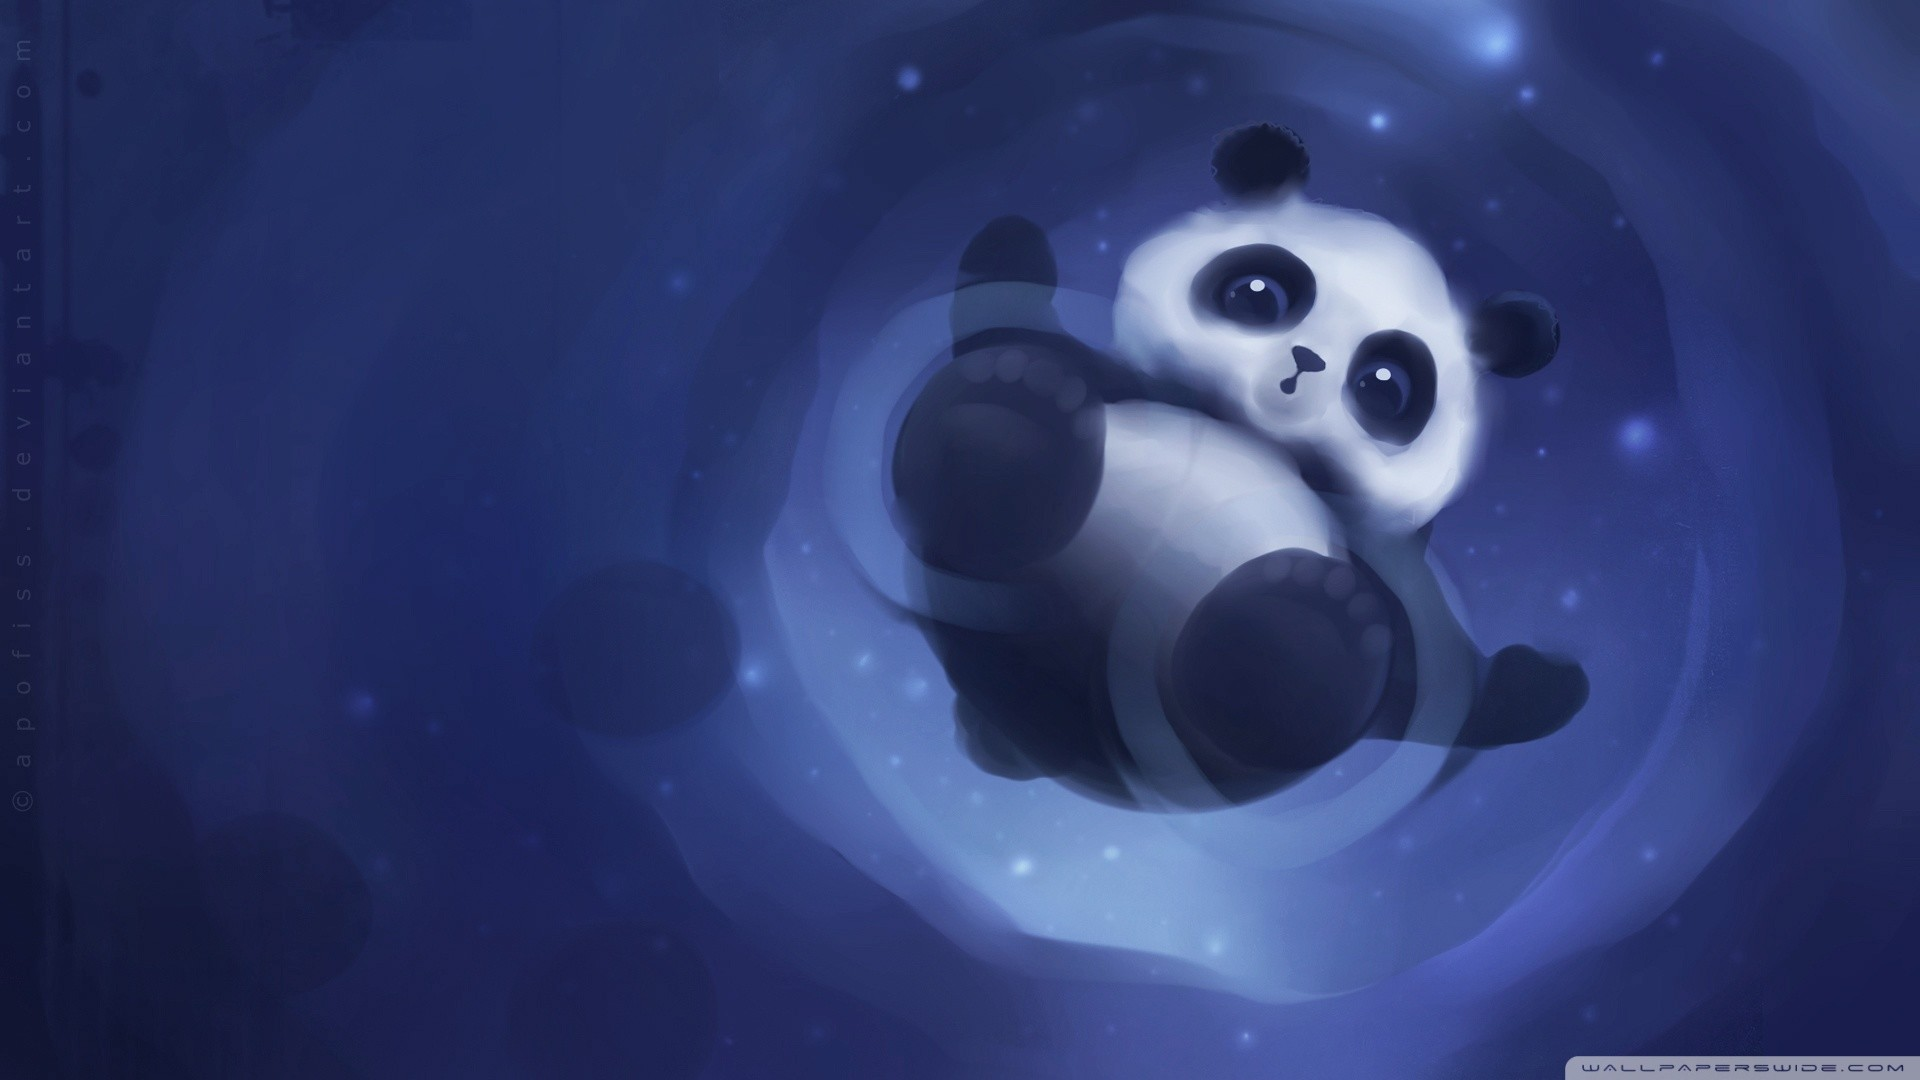 Panda Walking On Water HD Wide Wallpaper for Widescreen